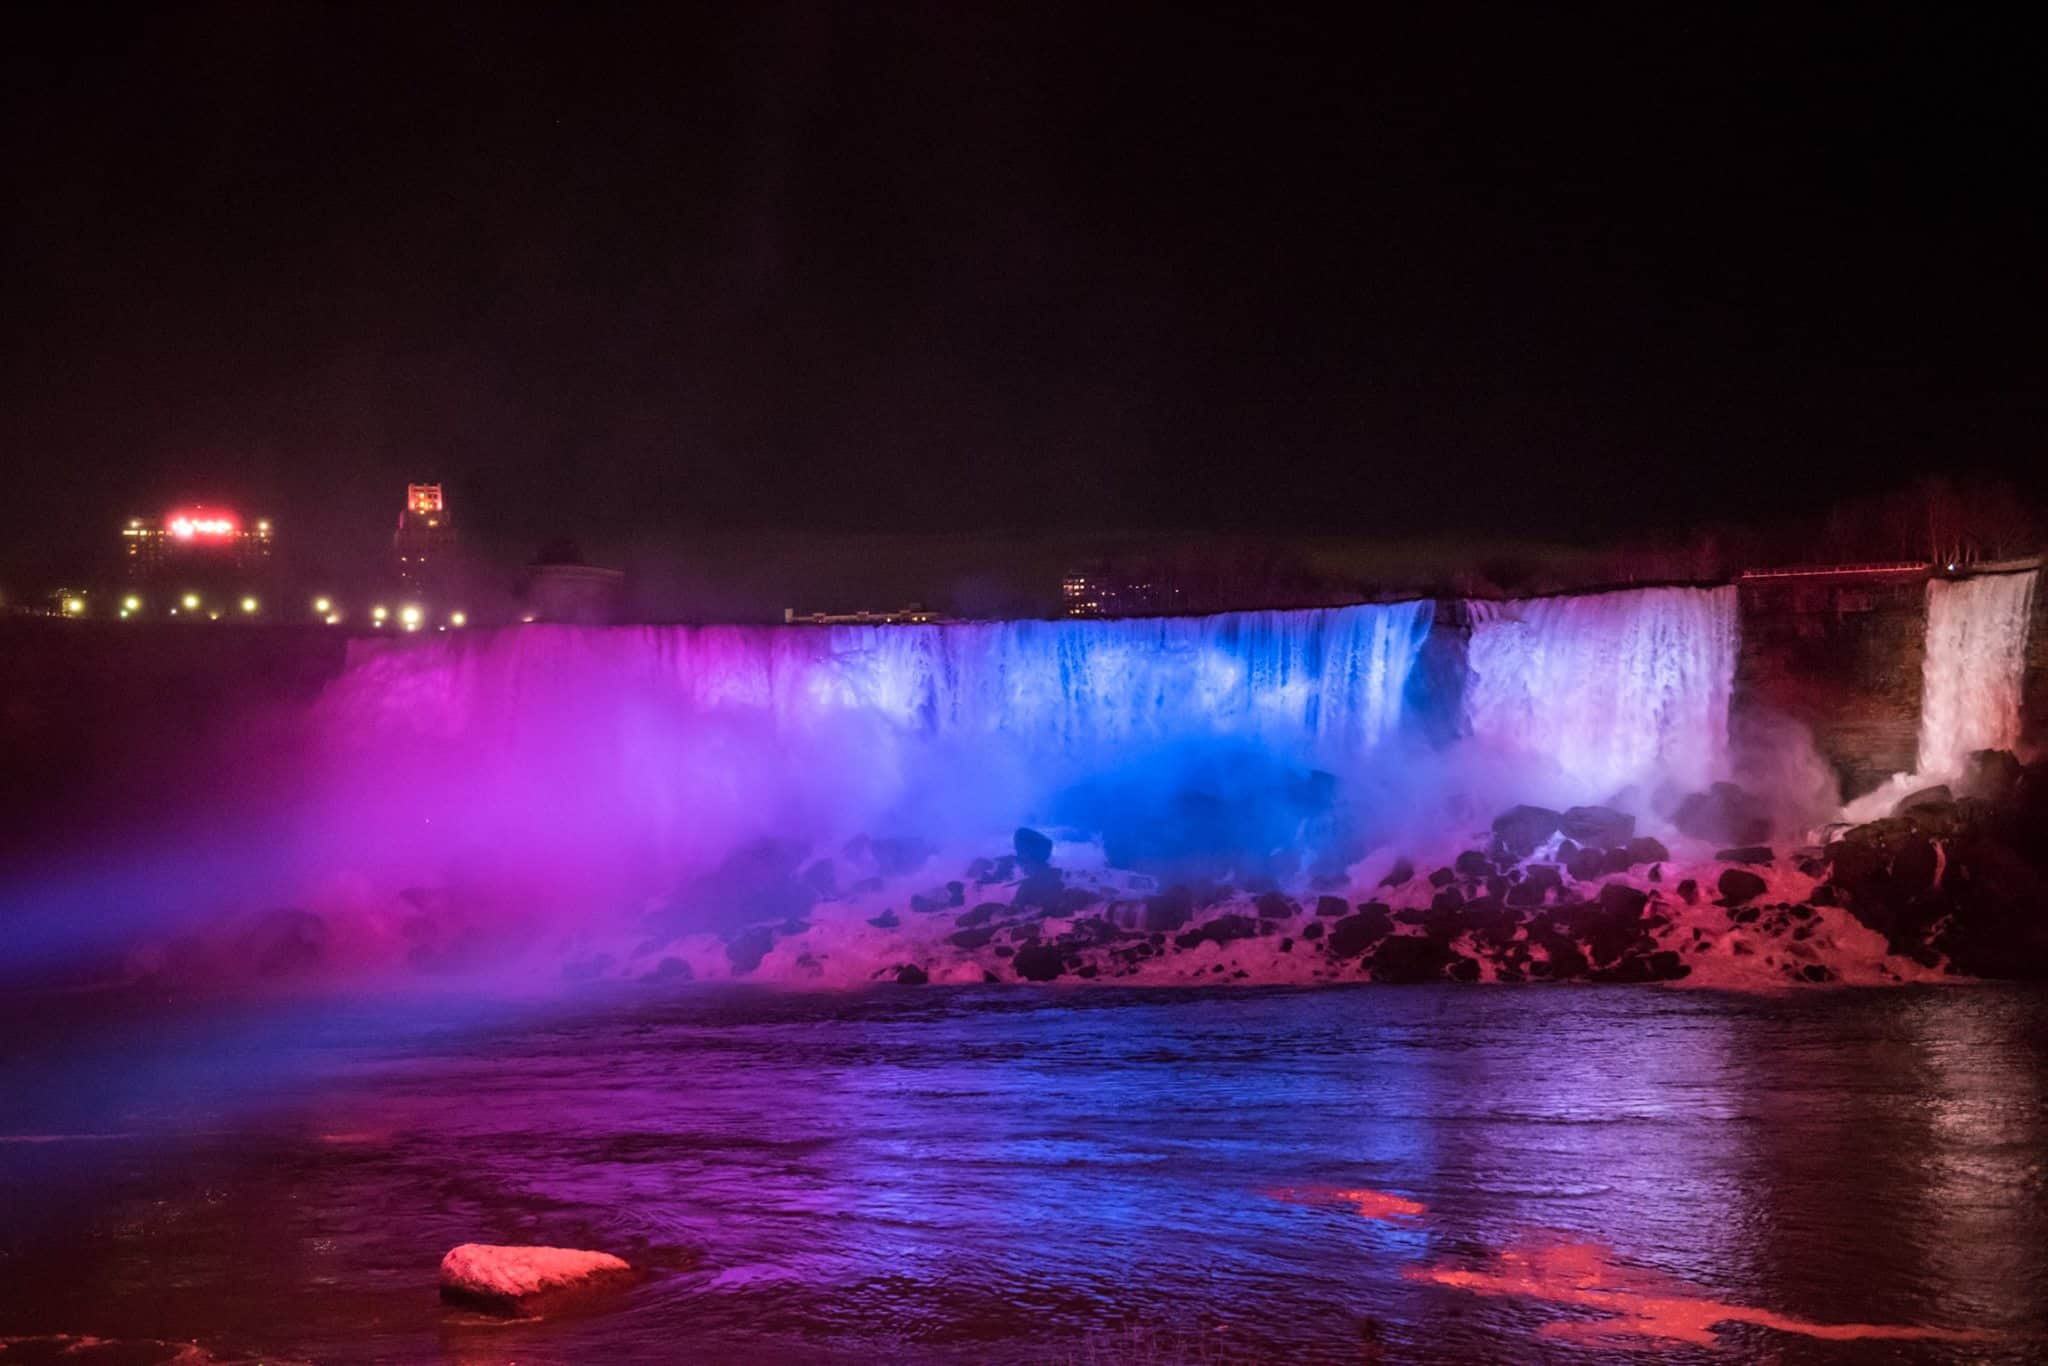 Niagara Falls At Night Wallpaper Hd Niagara Falls Shines In New Light